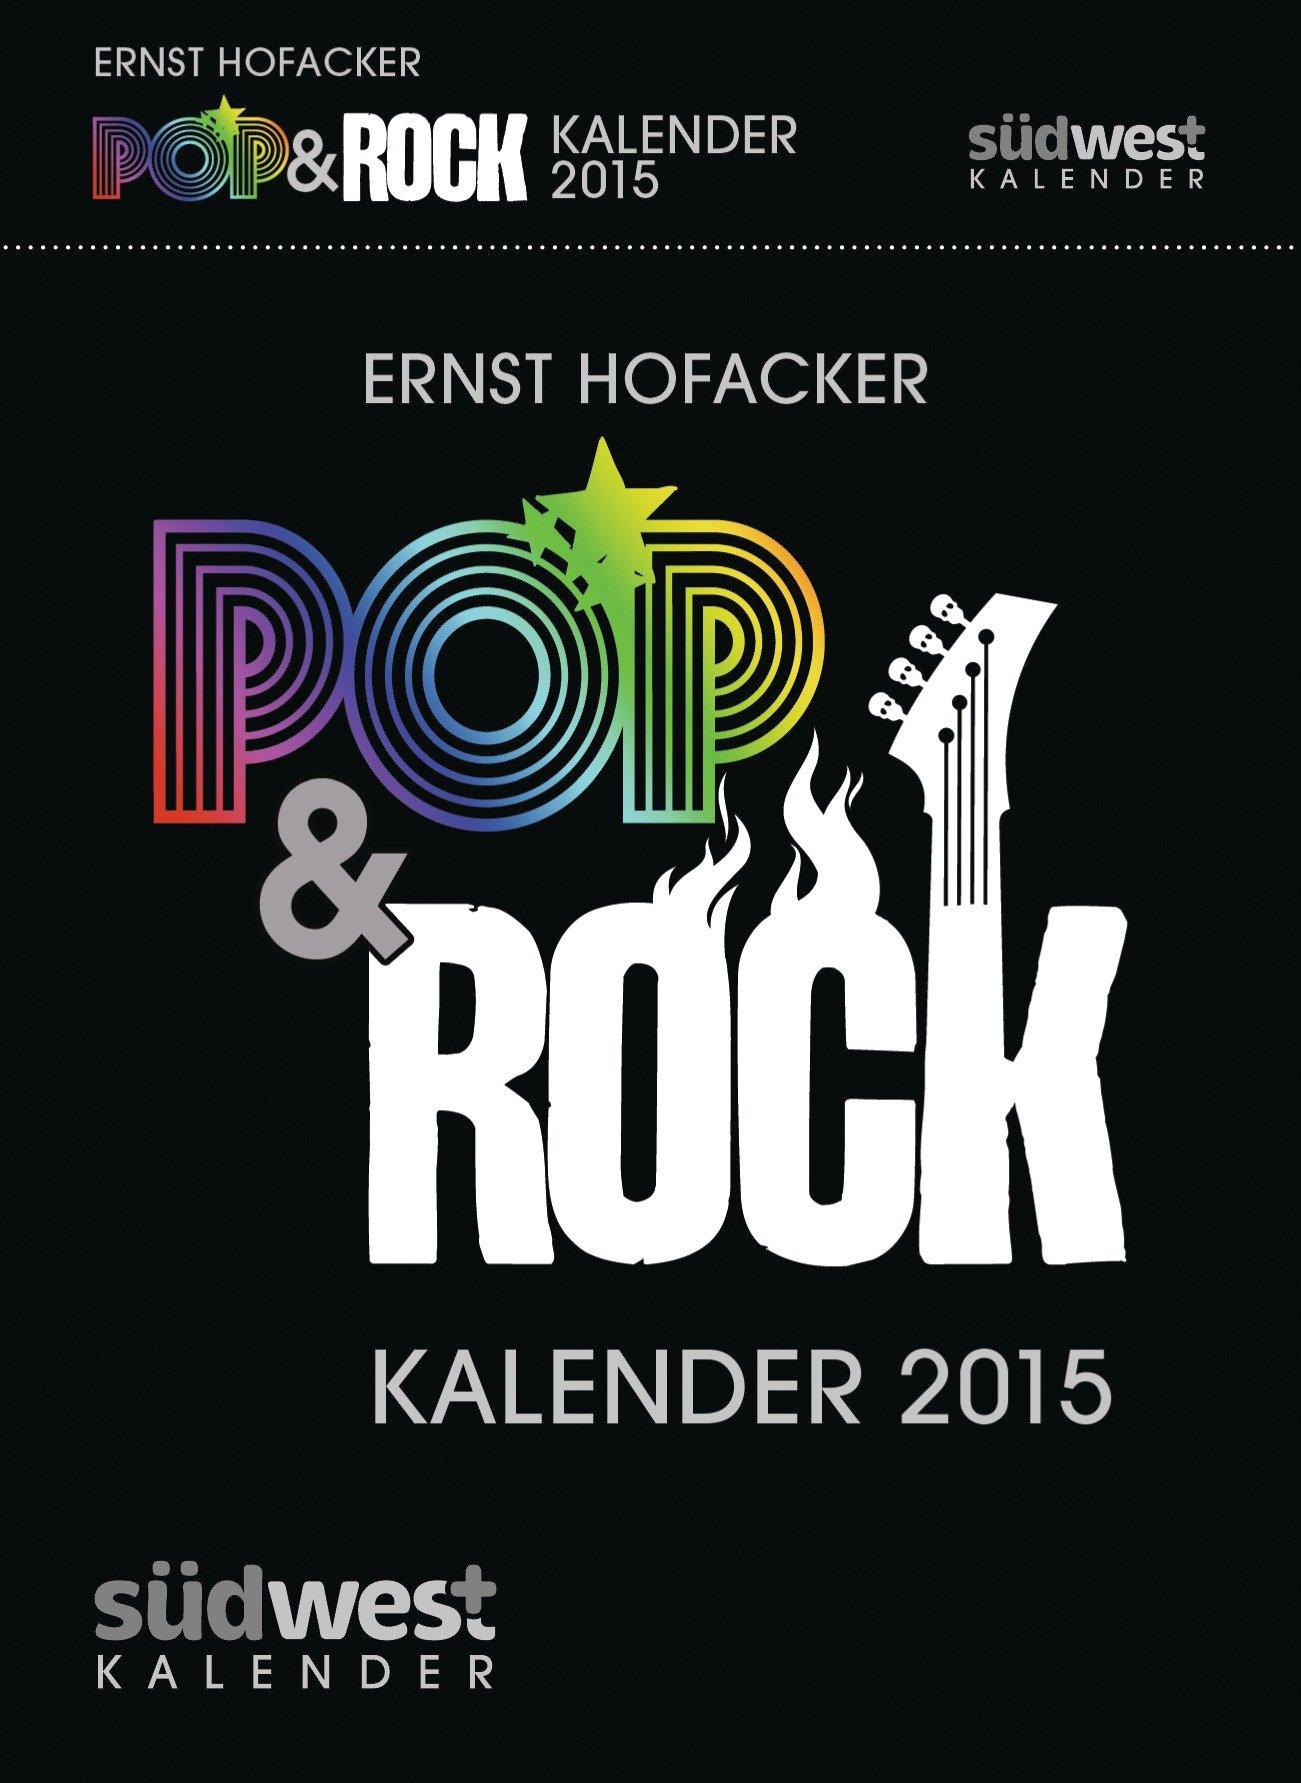 Pop & Rock Kalender 2015 Textabreißkalender